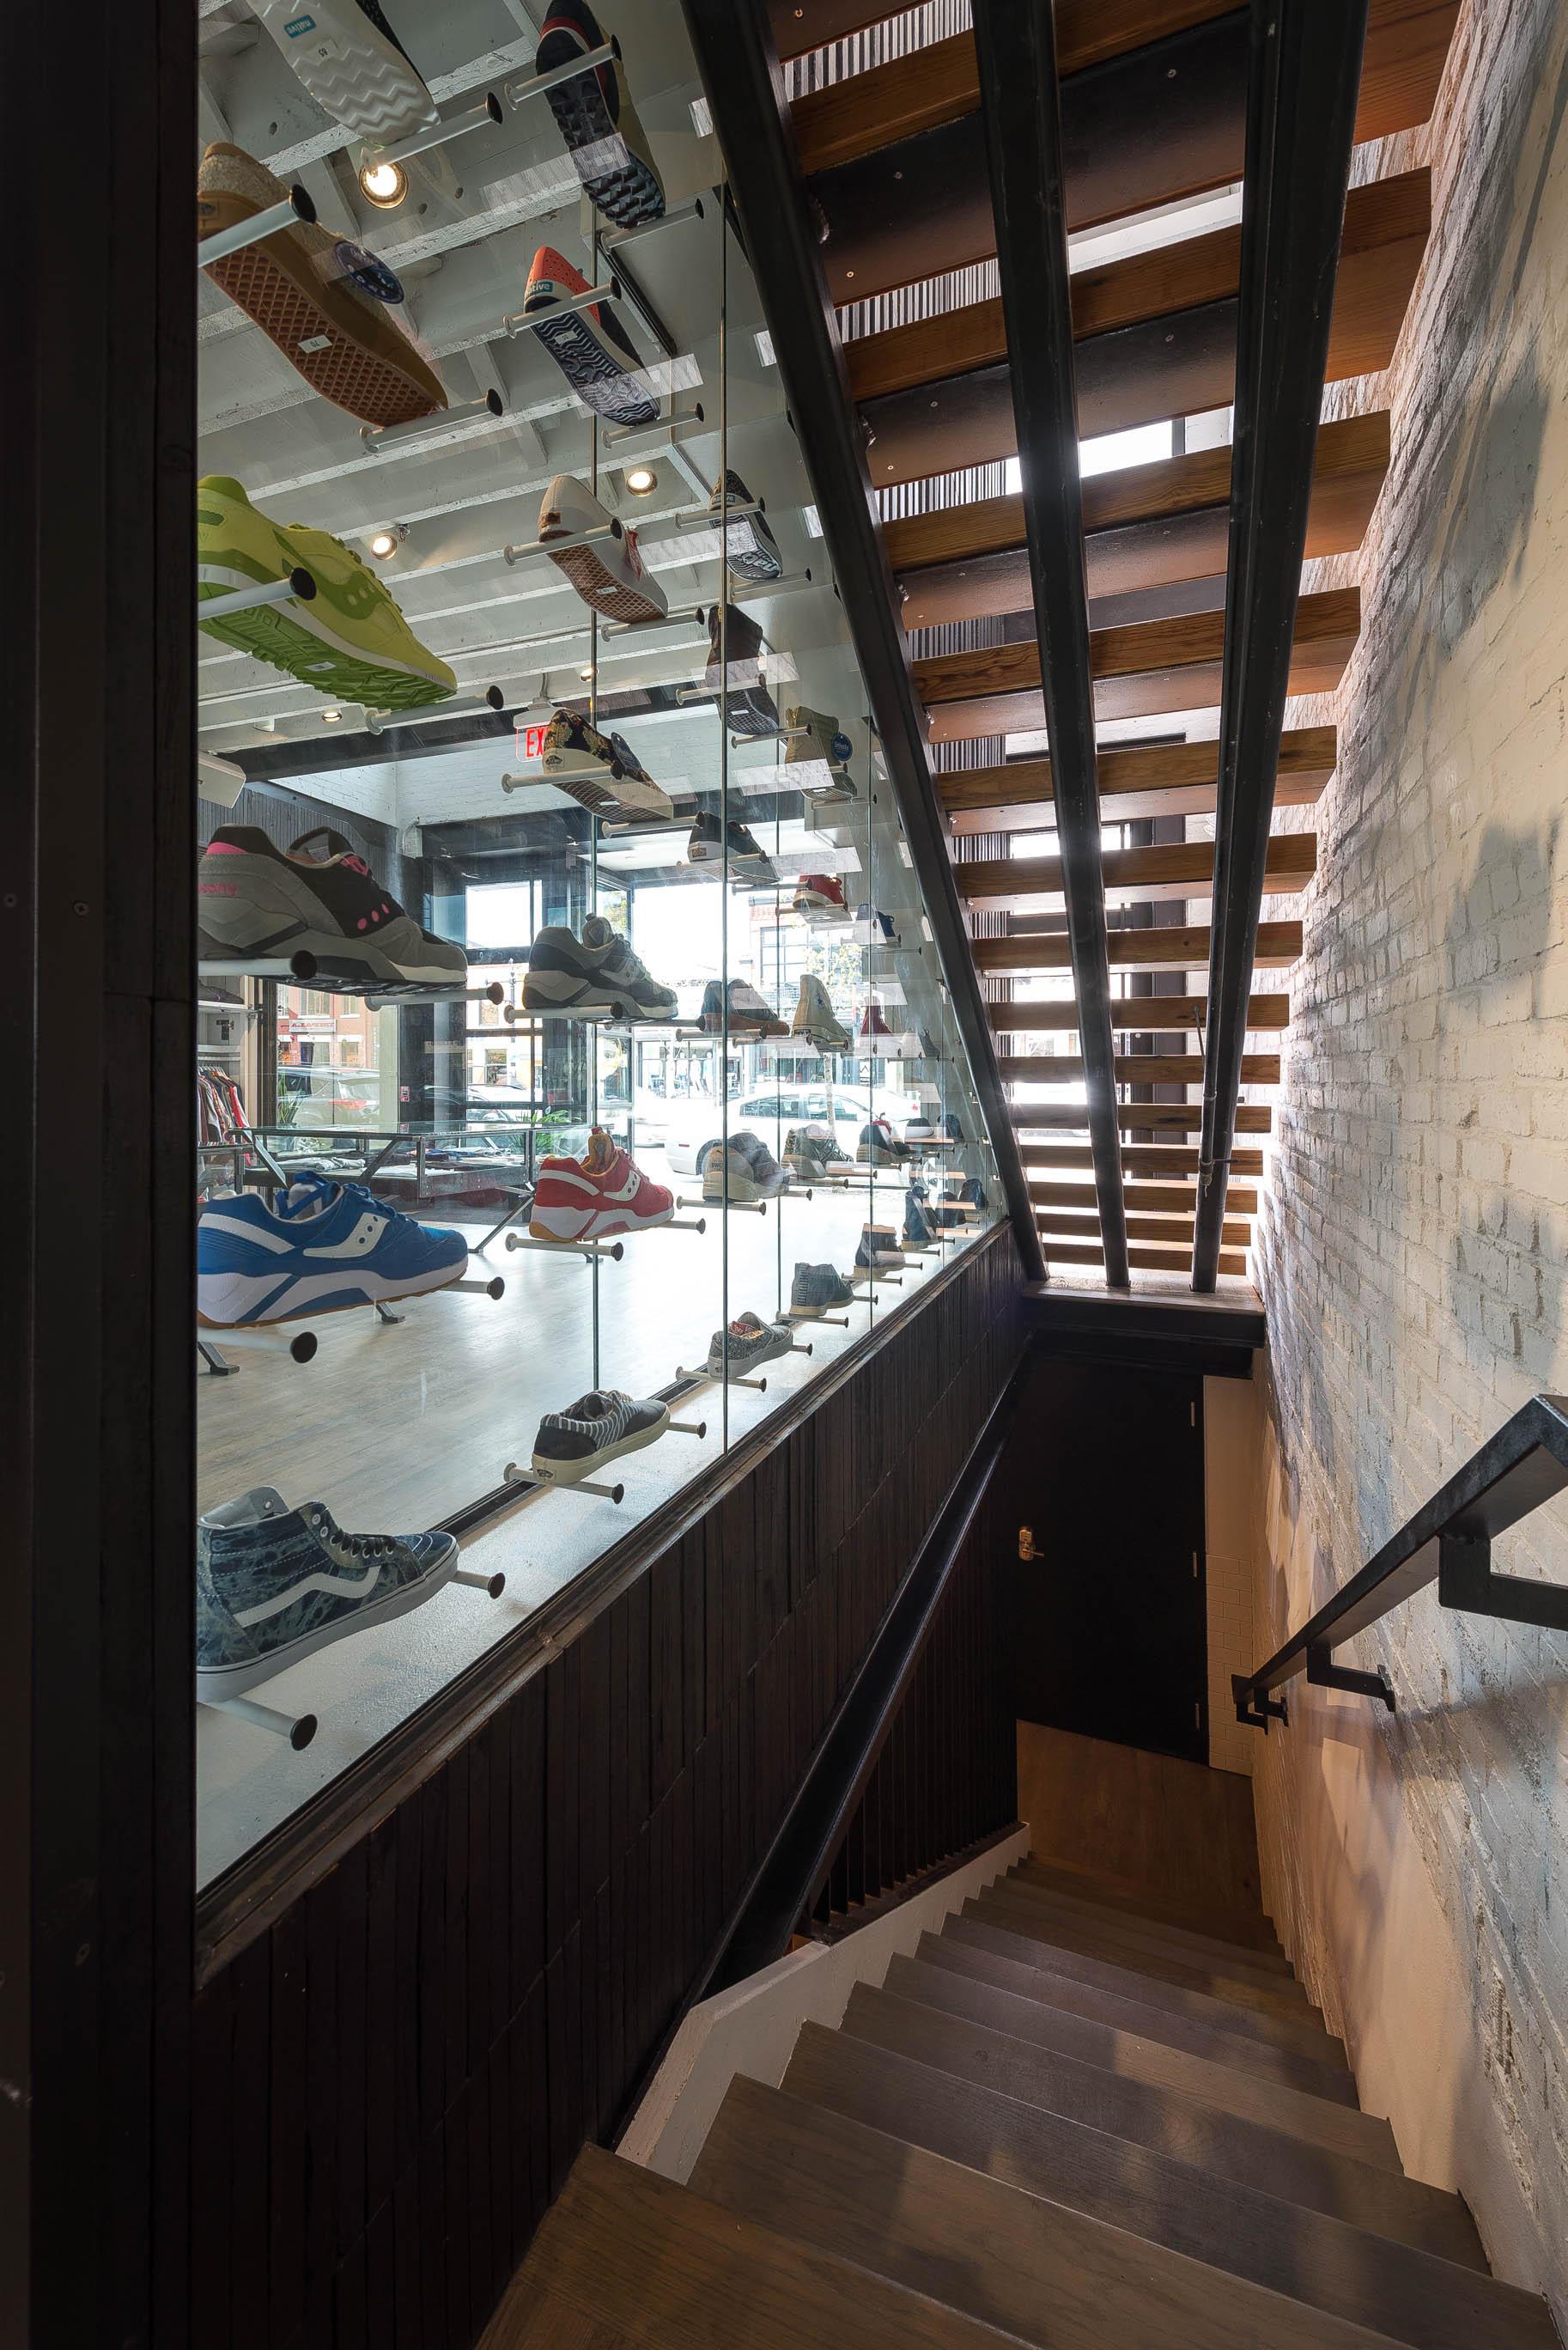 studio-saint-bars-and-restaurants-maketto-washington-dc-10